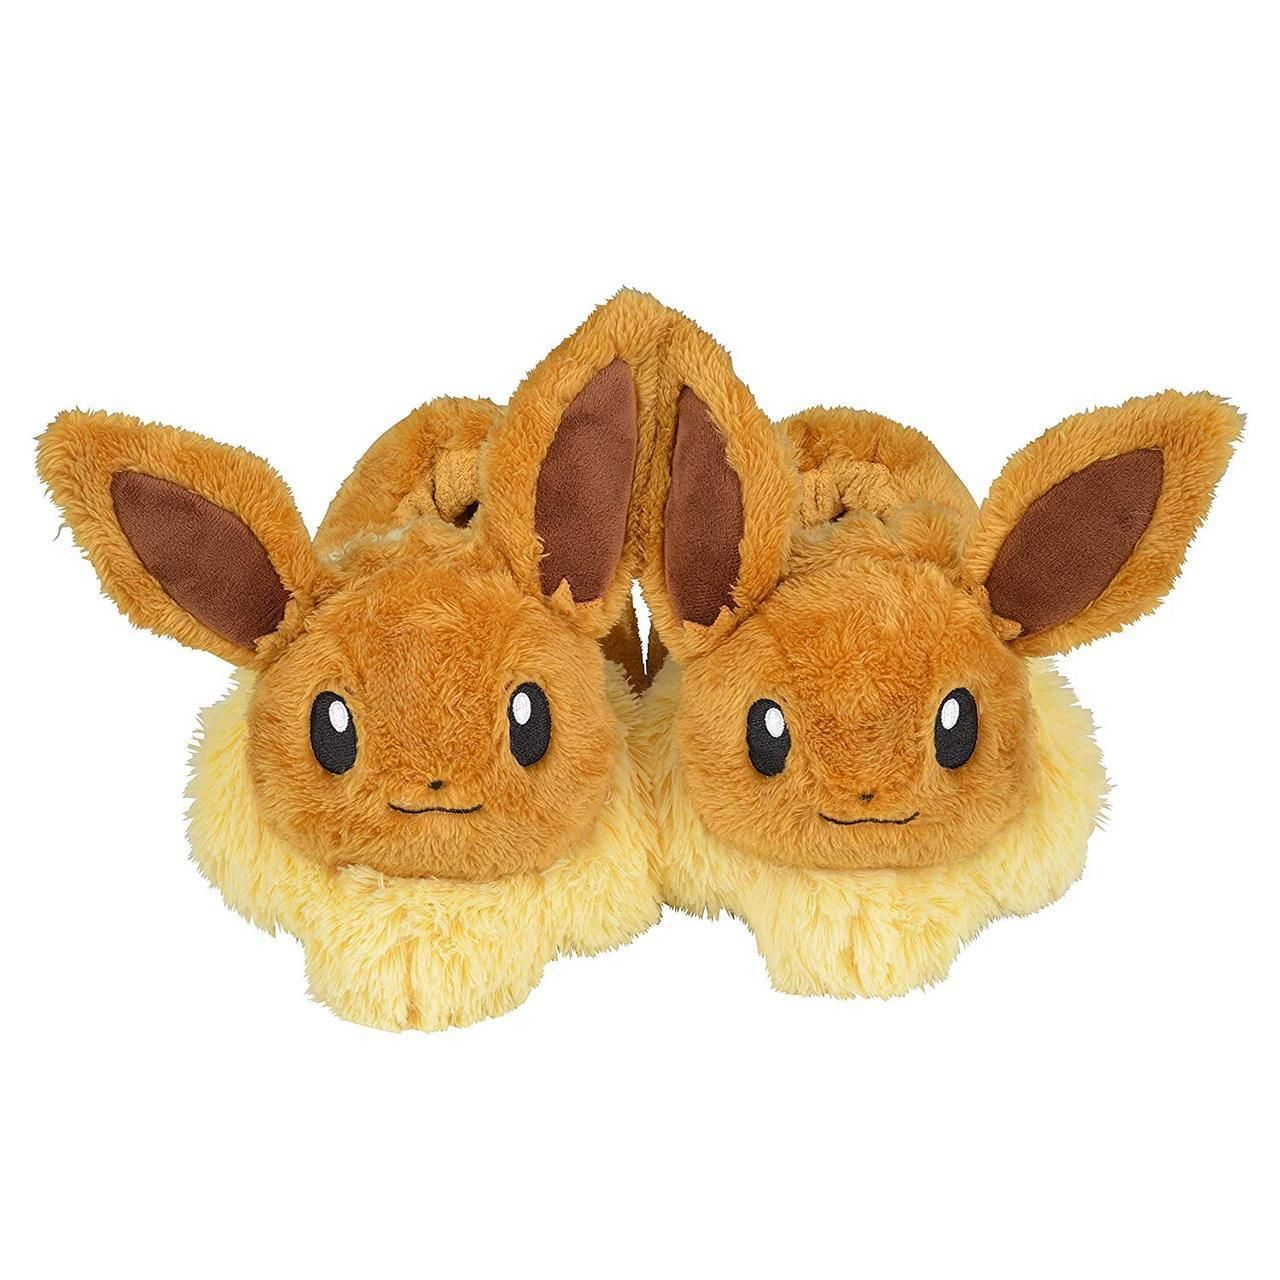 Pokemon Slippers released by the Pokemon Center -